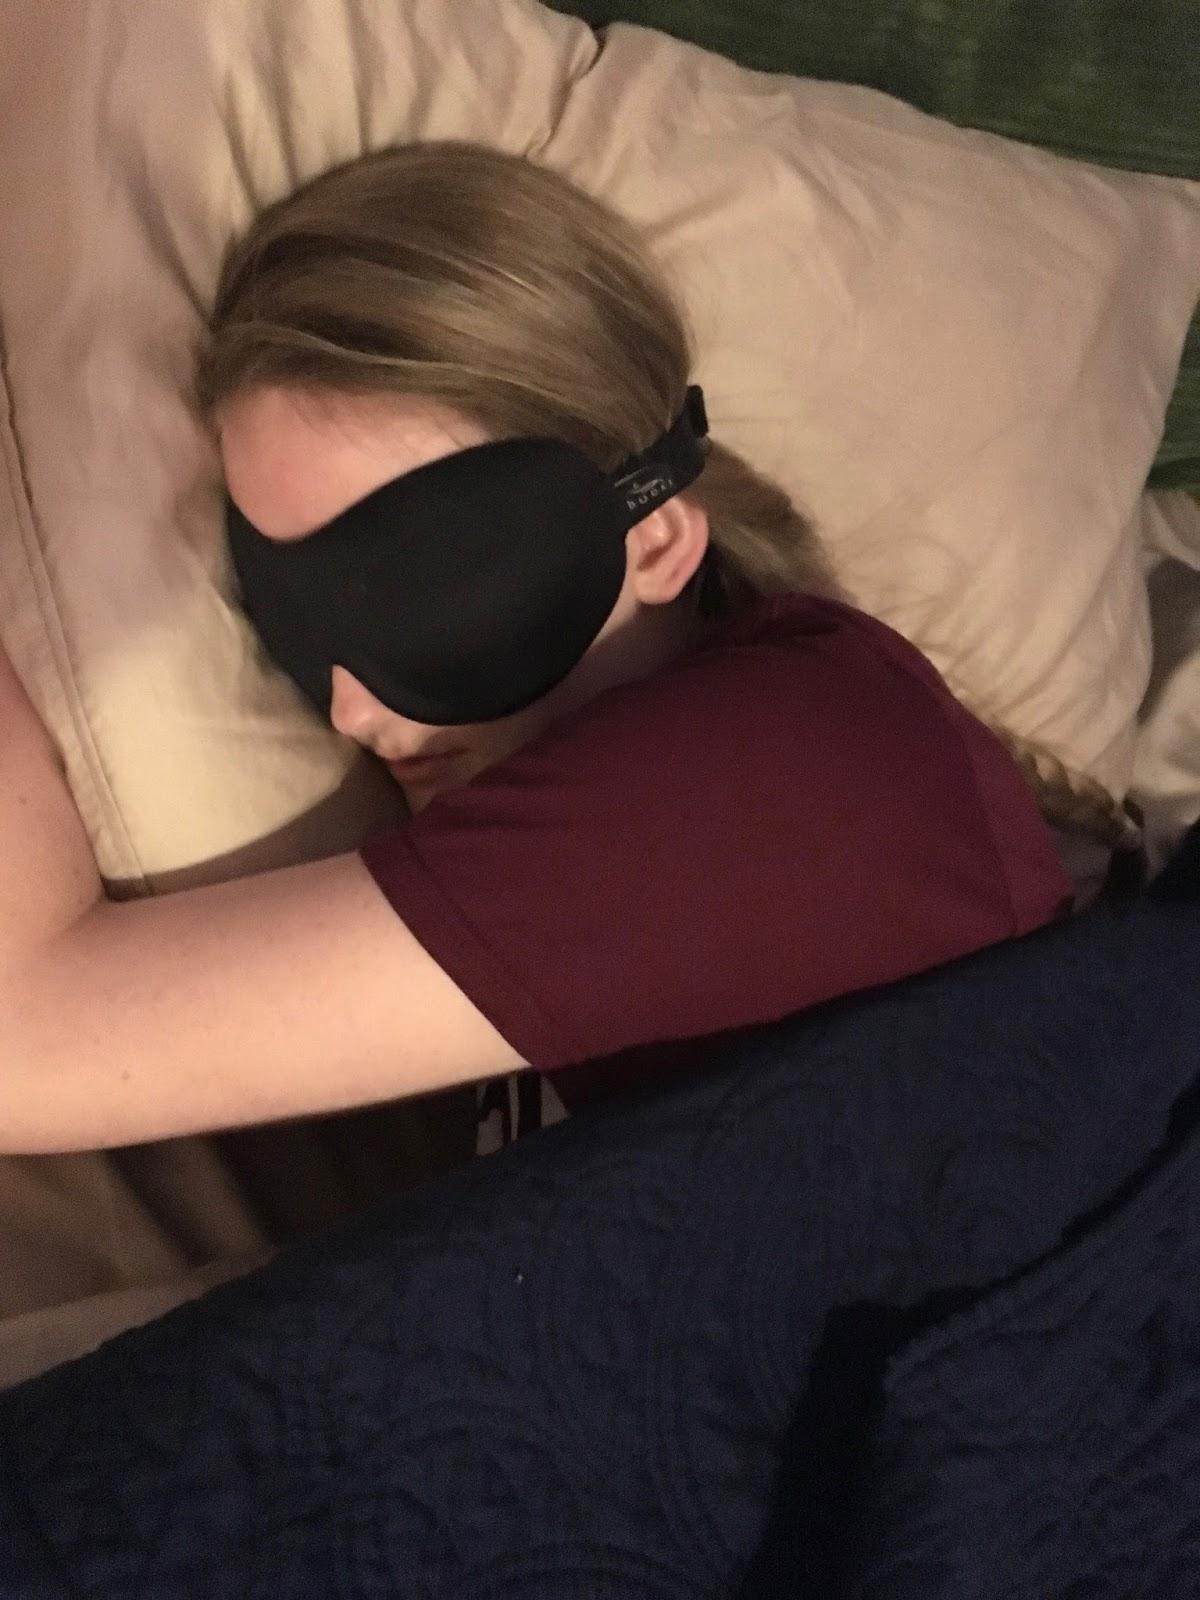 Freshman Insomnia: Seven Tips To Get More ZZZ